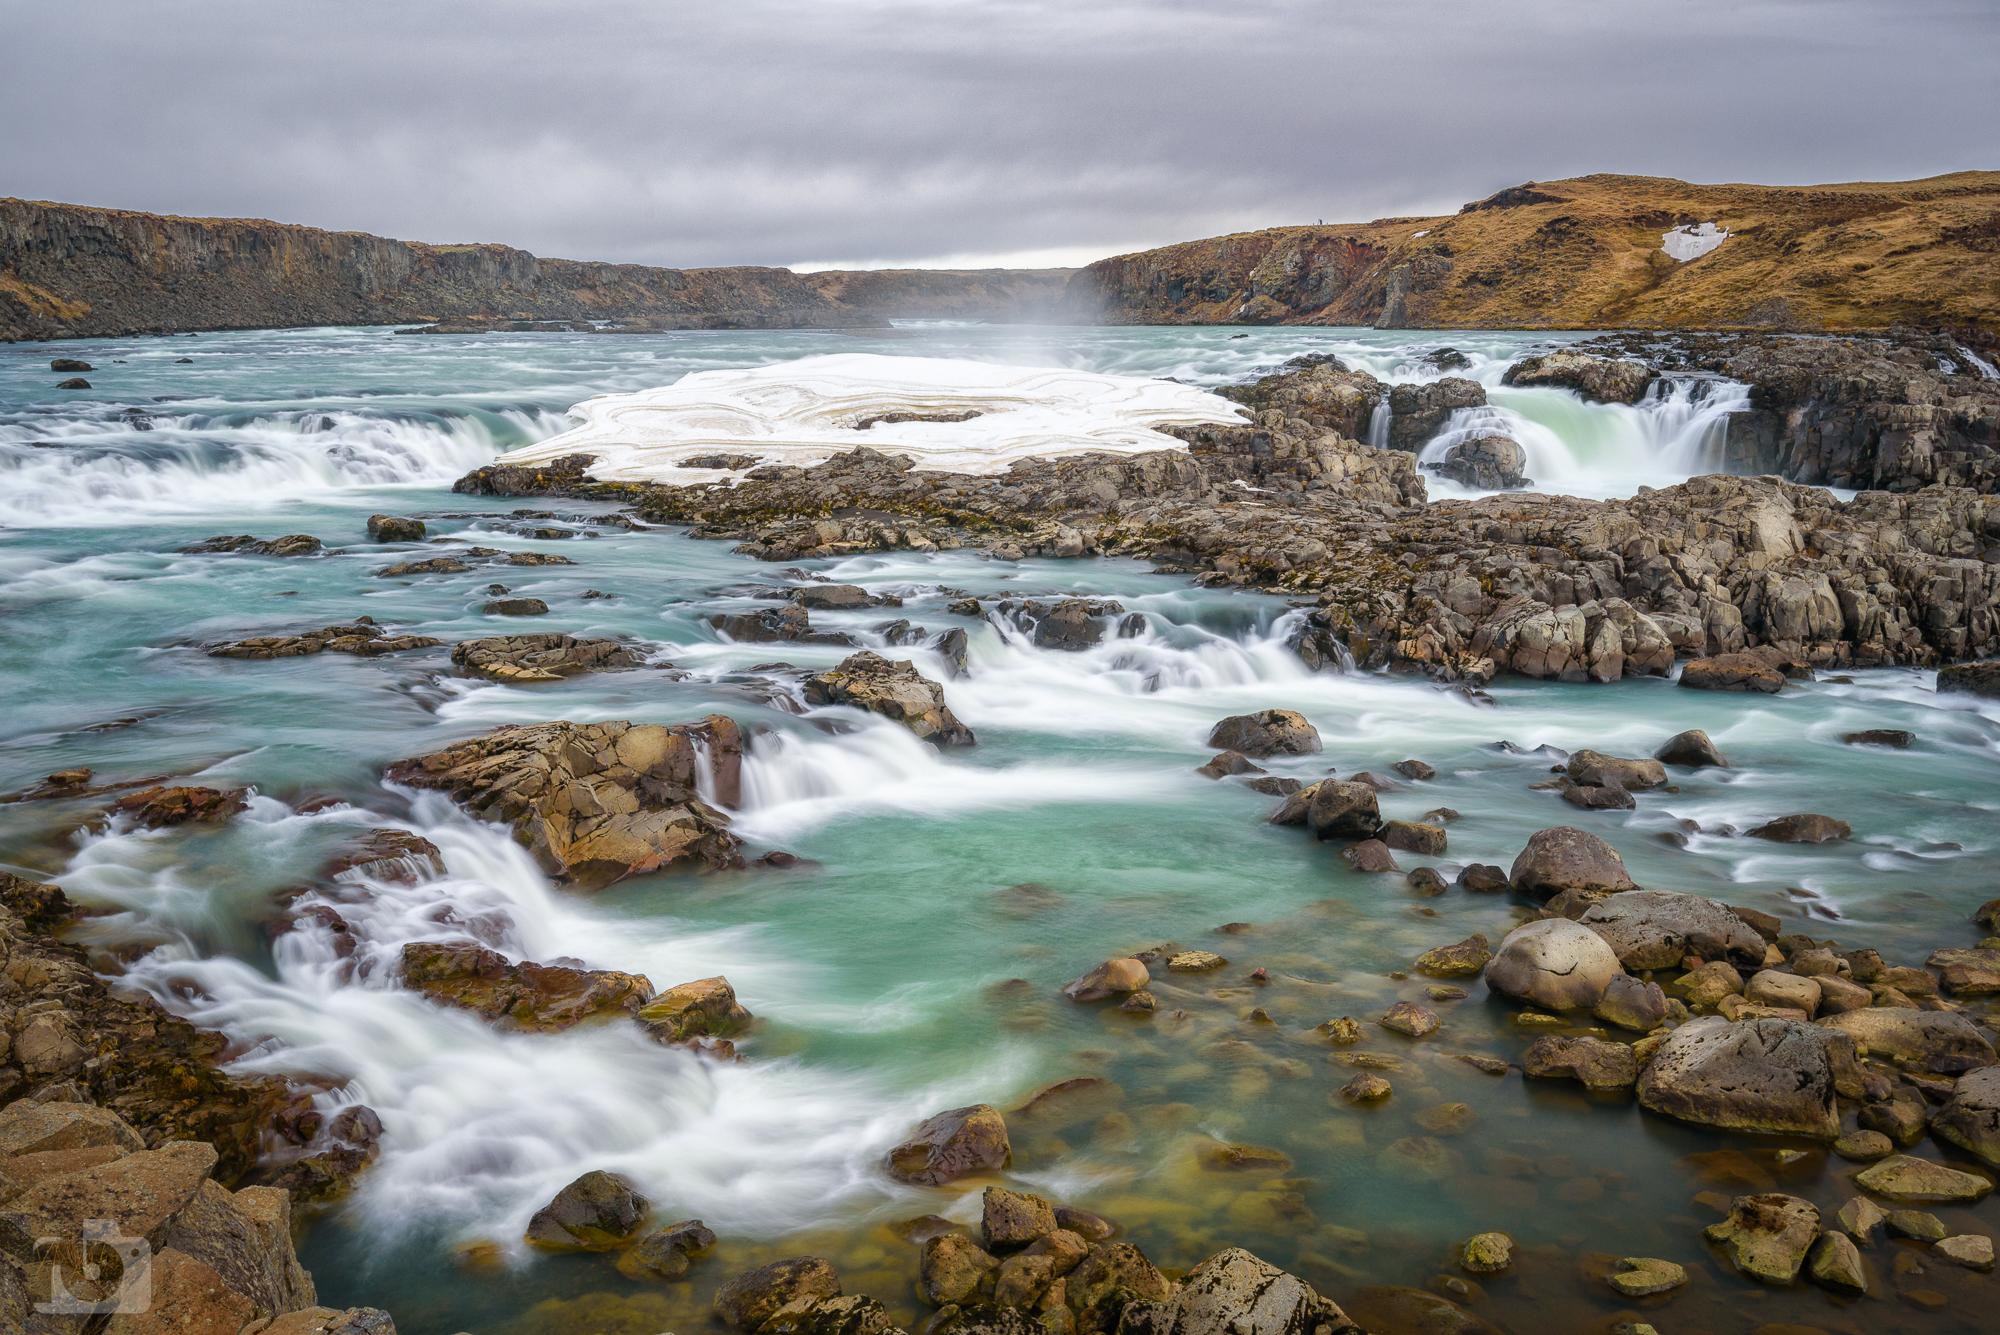 Urridafoss, Iceland